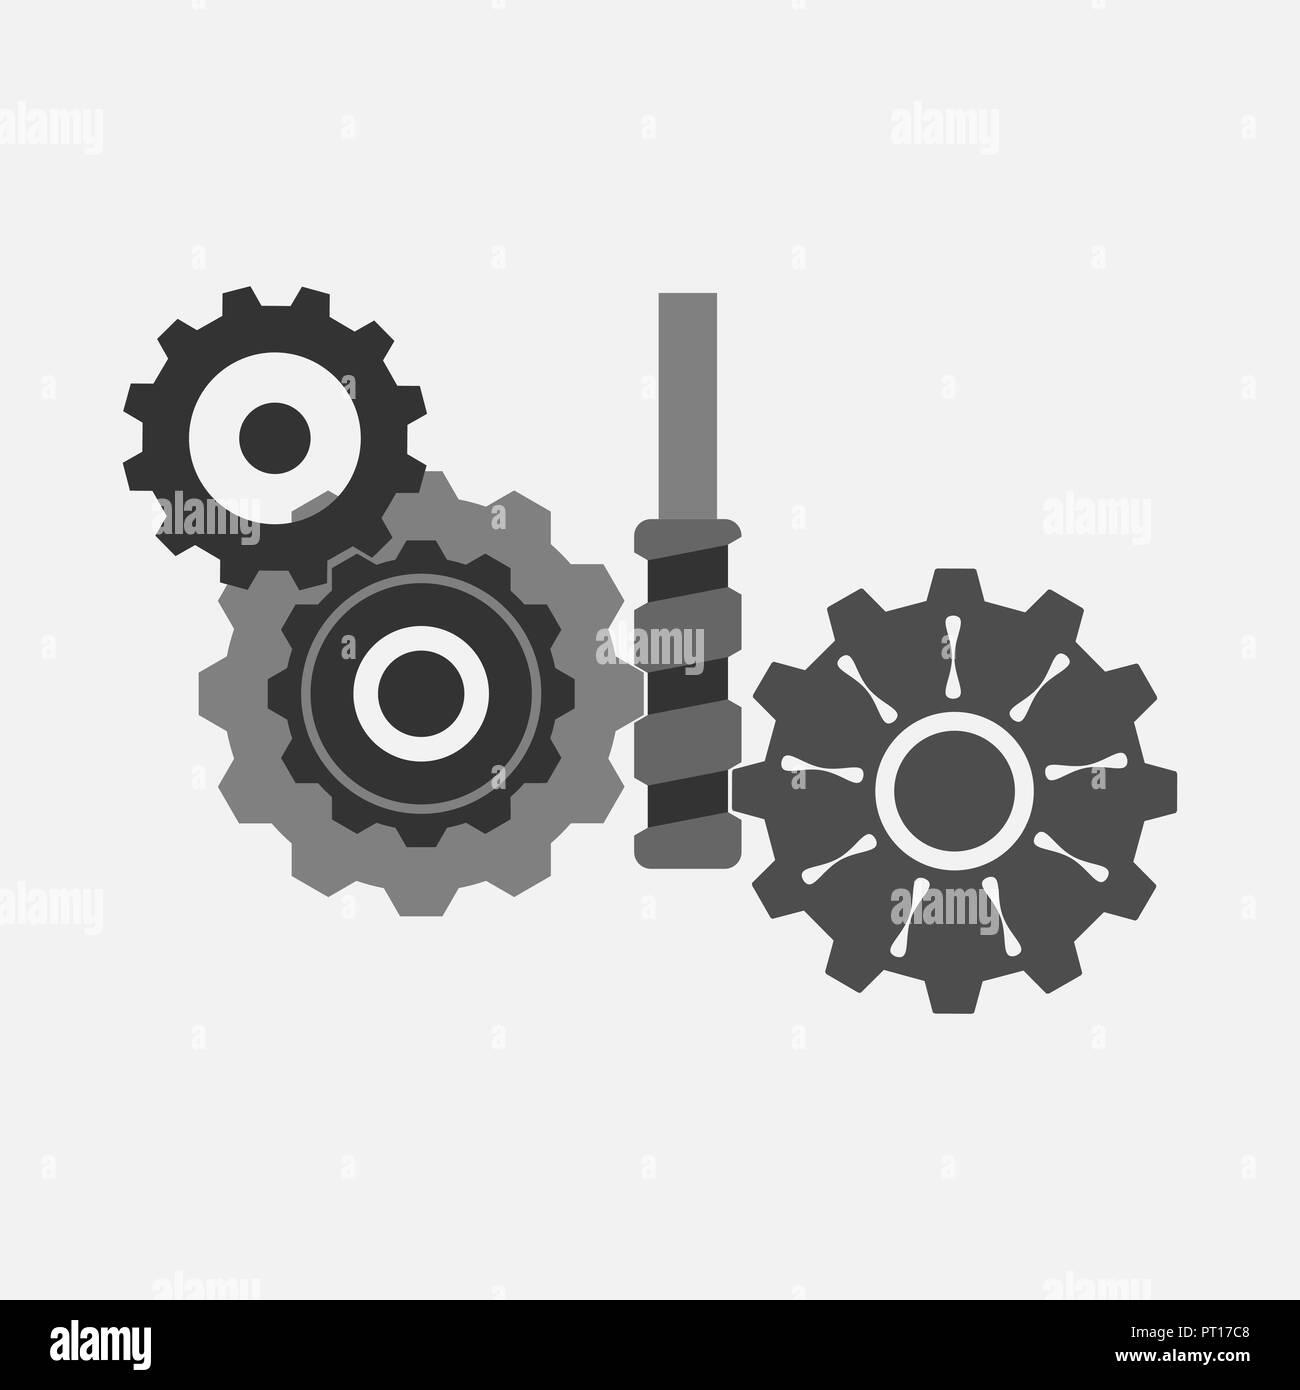 Worm Gear Stock Photos & Worm Gear Stock Images - Alamy